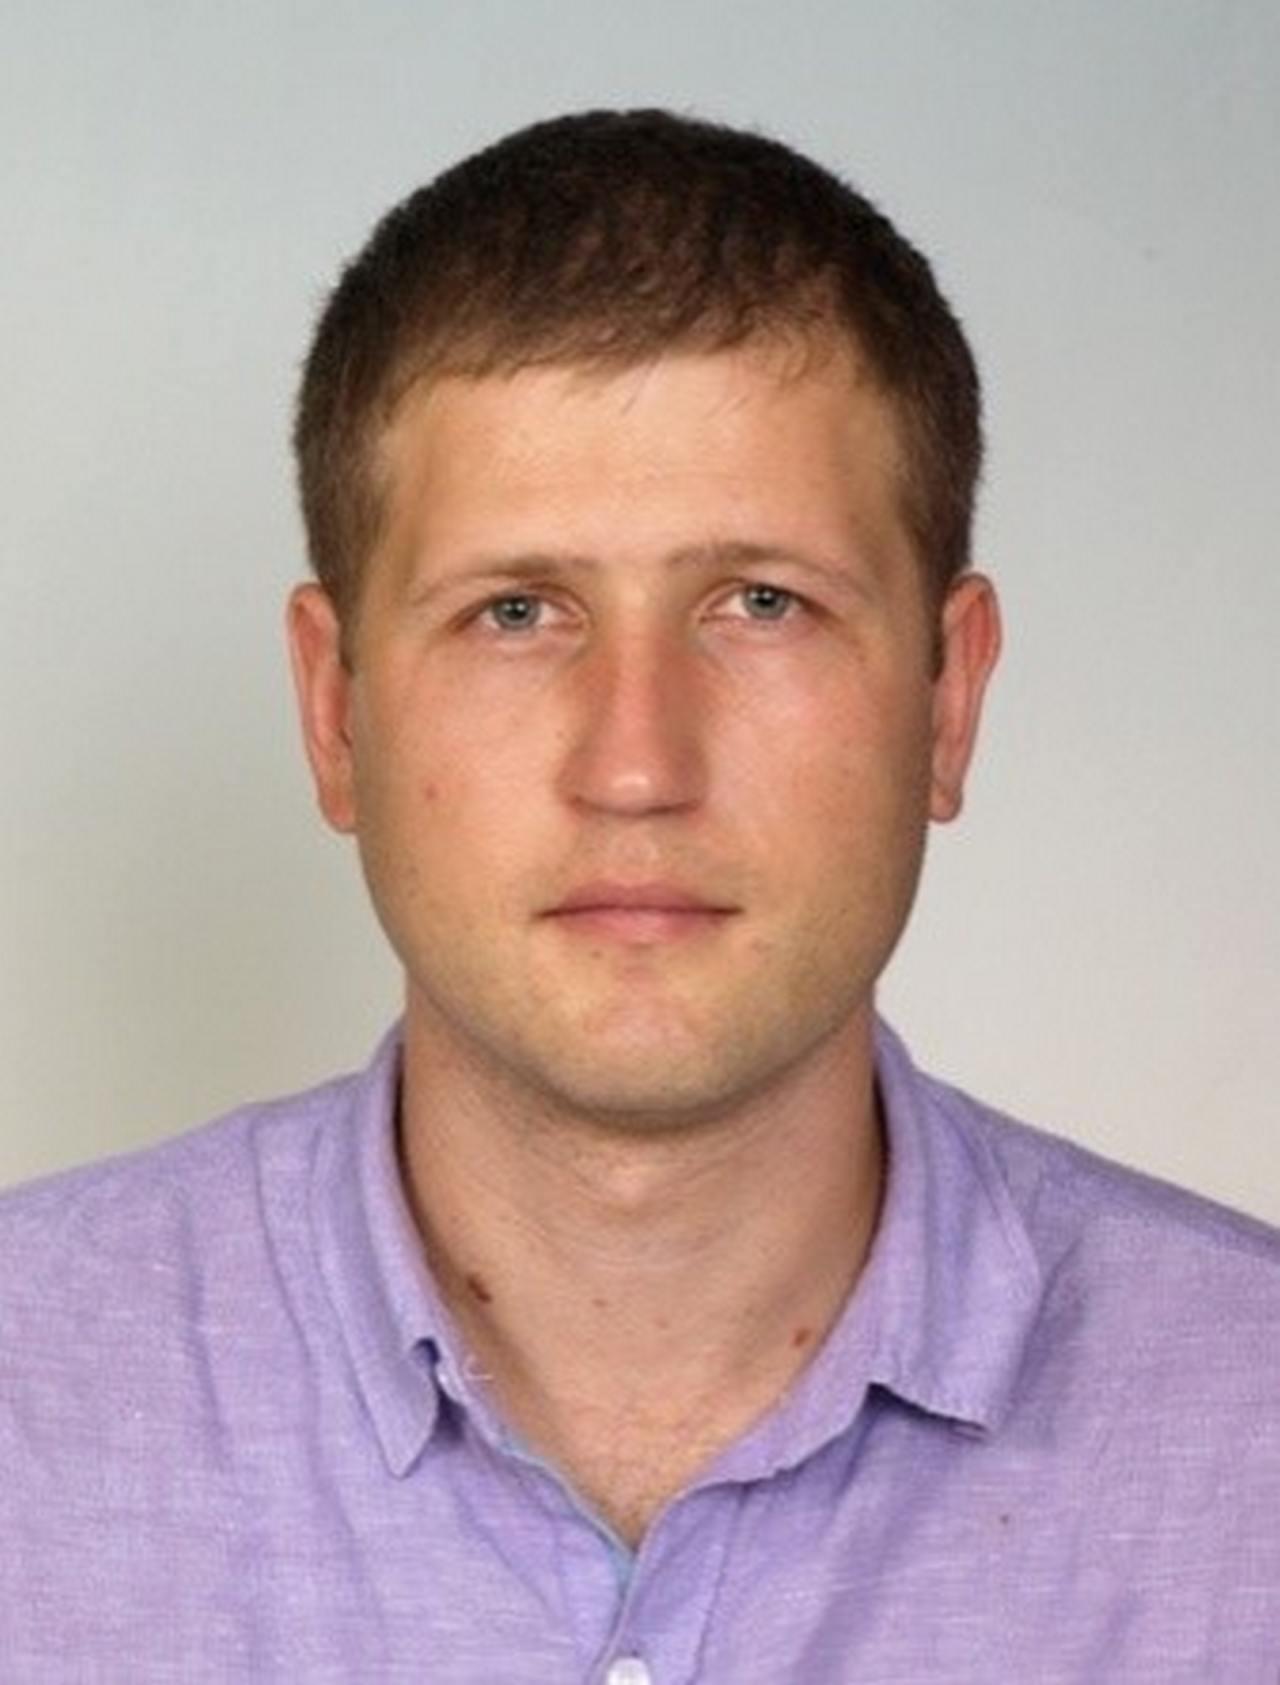 Максим Харченко